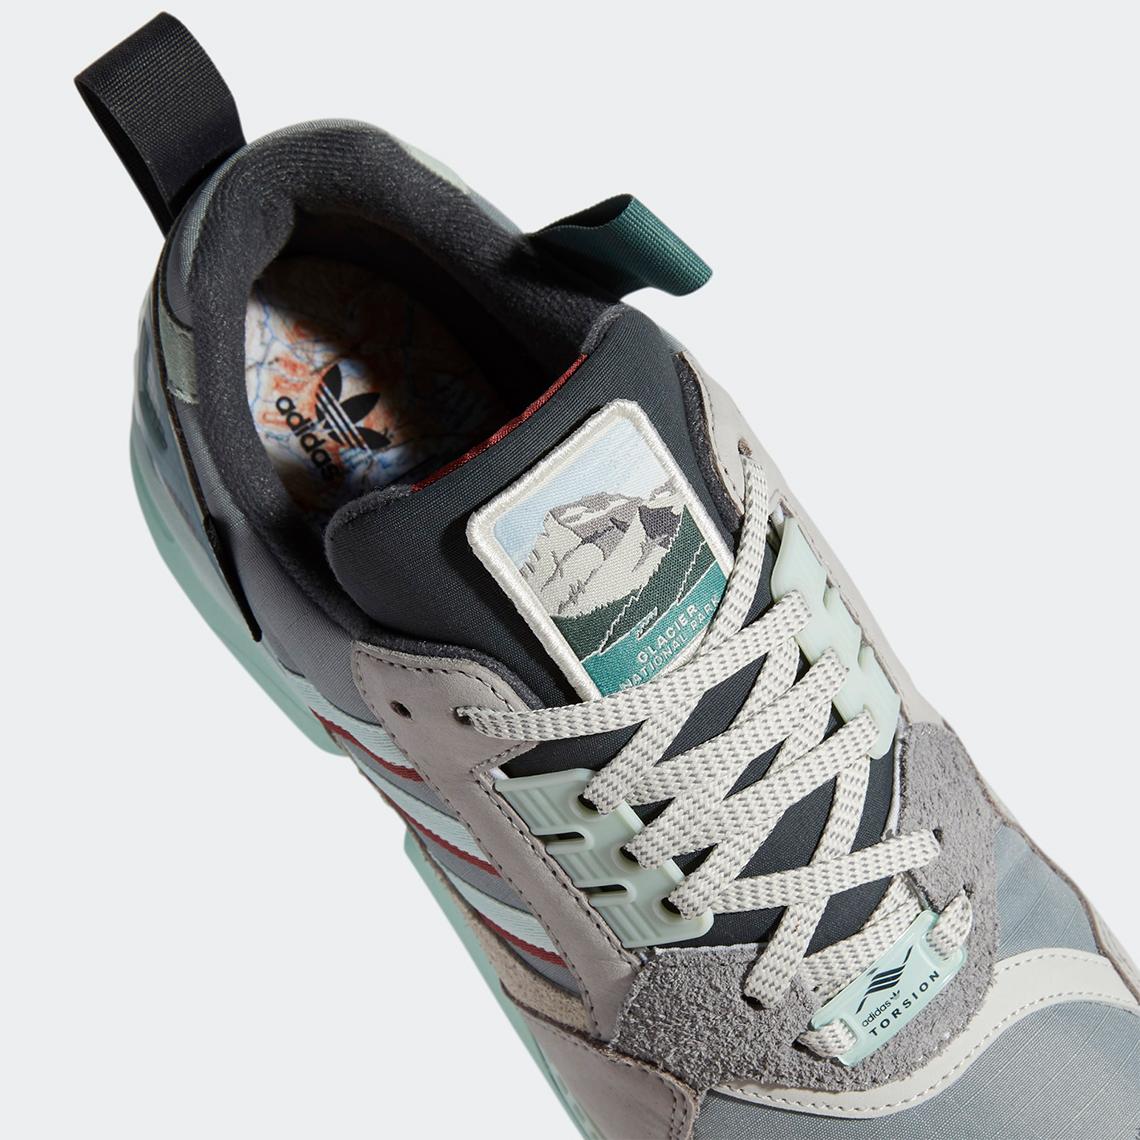 National-Parks-Foundation-adidas-ZX-9000-FY5172-8.jpg?w=1140